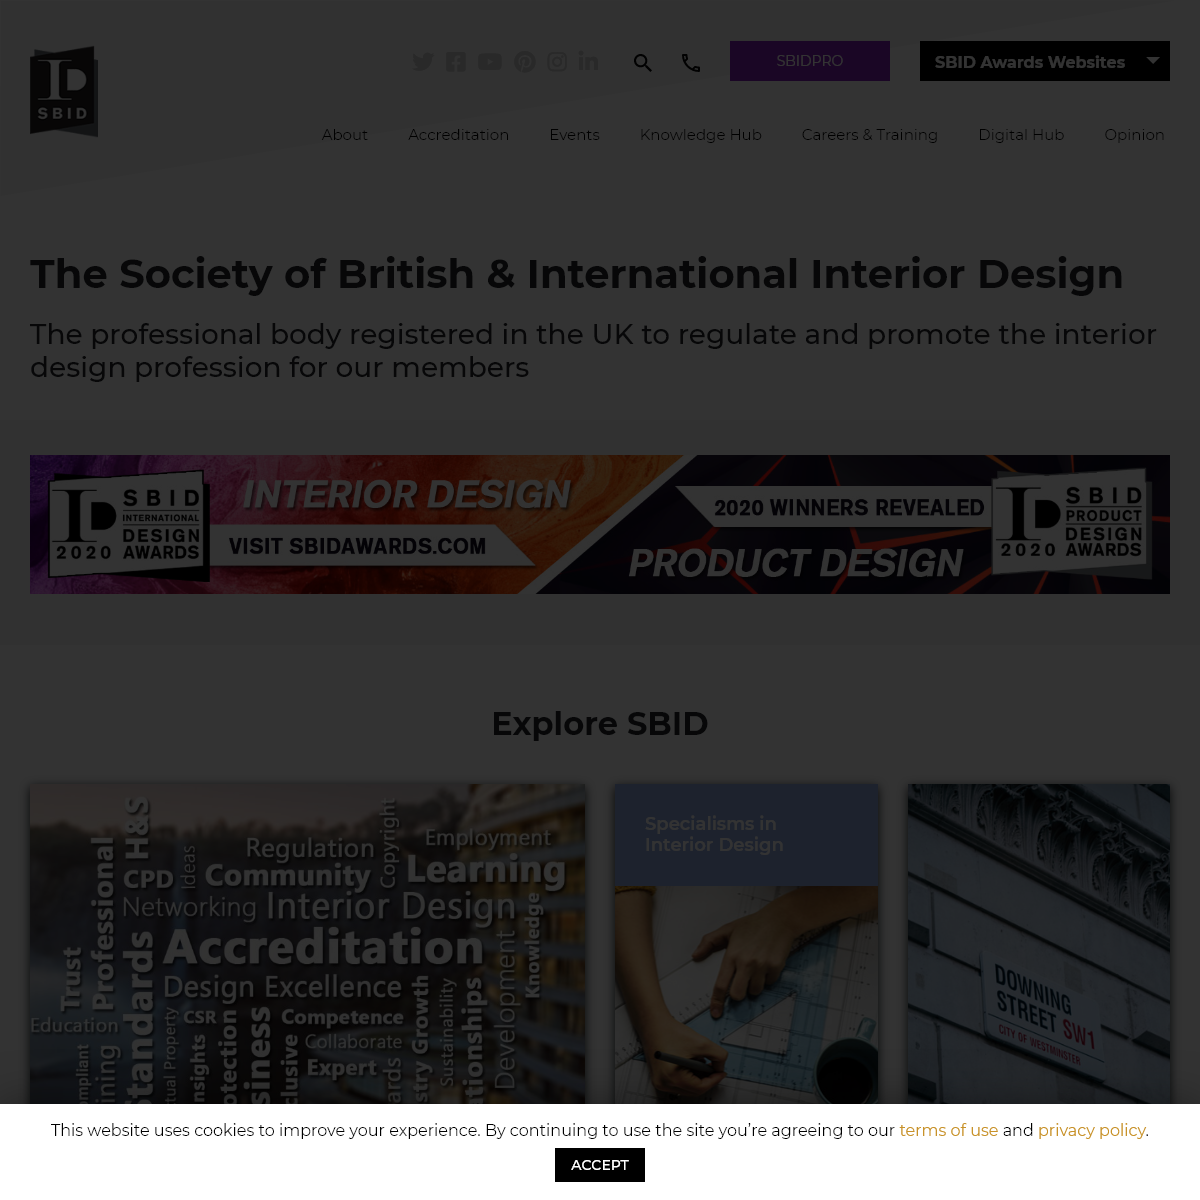 The Society of British & International Interior Designers - SBID